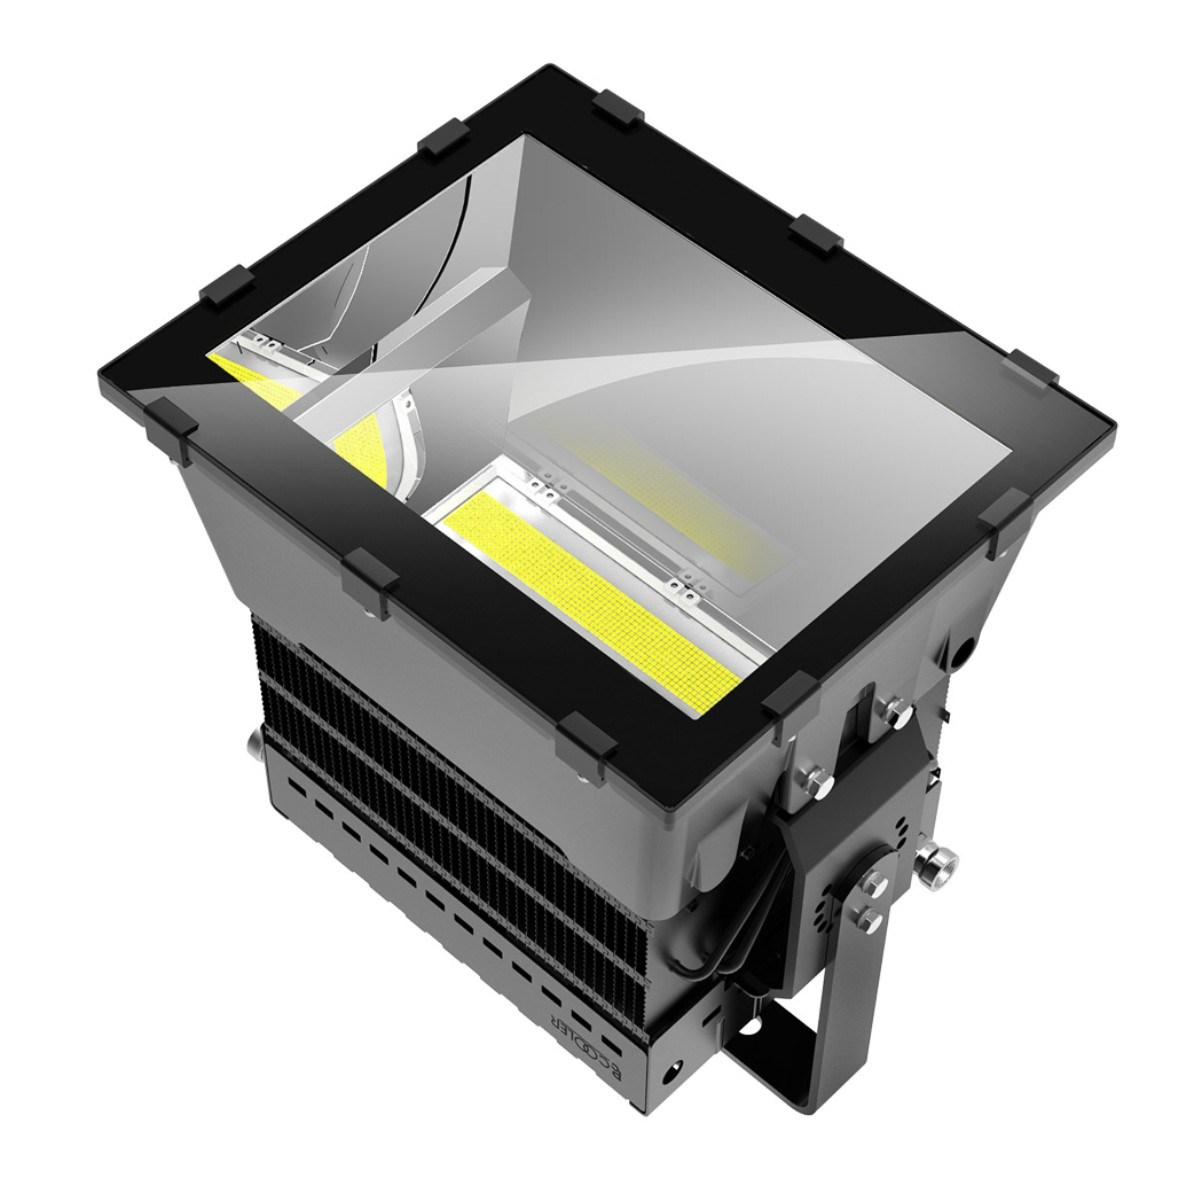 1000W High Quality Outdoor Stadium Light LED Flood Light